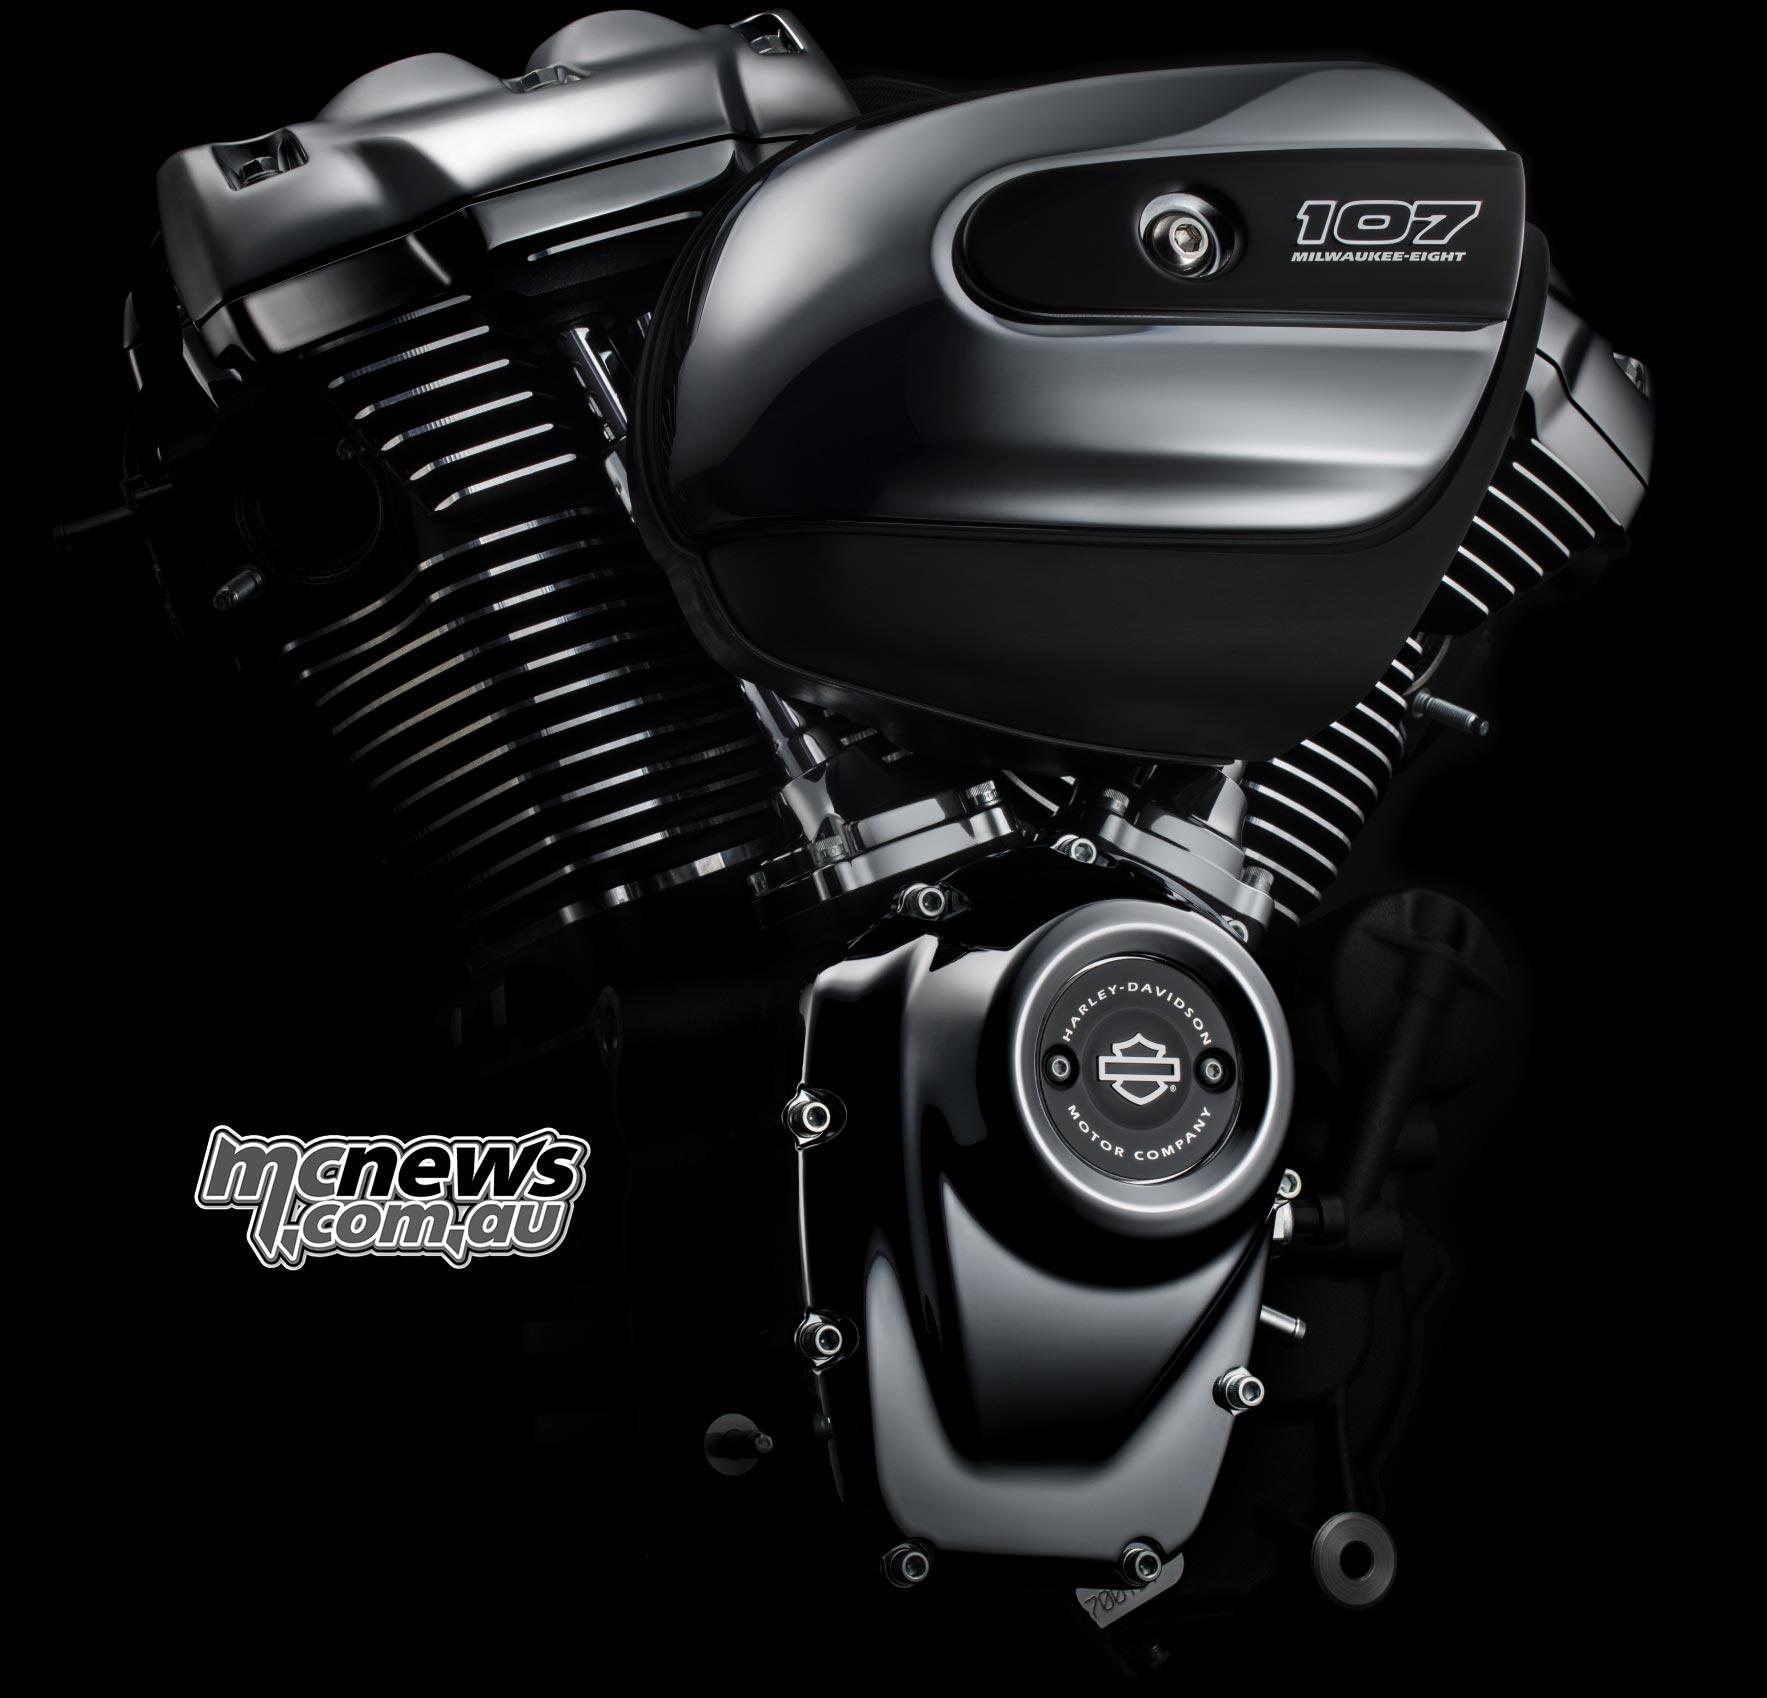 Harley Davidson Milwaukee-Eight